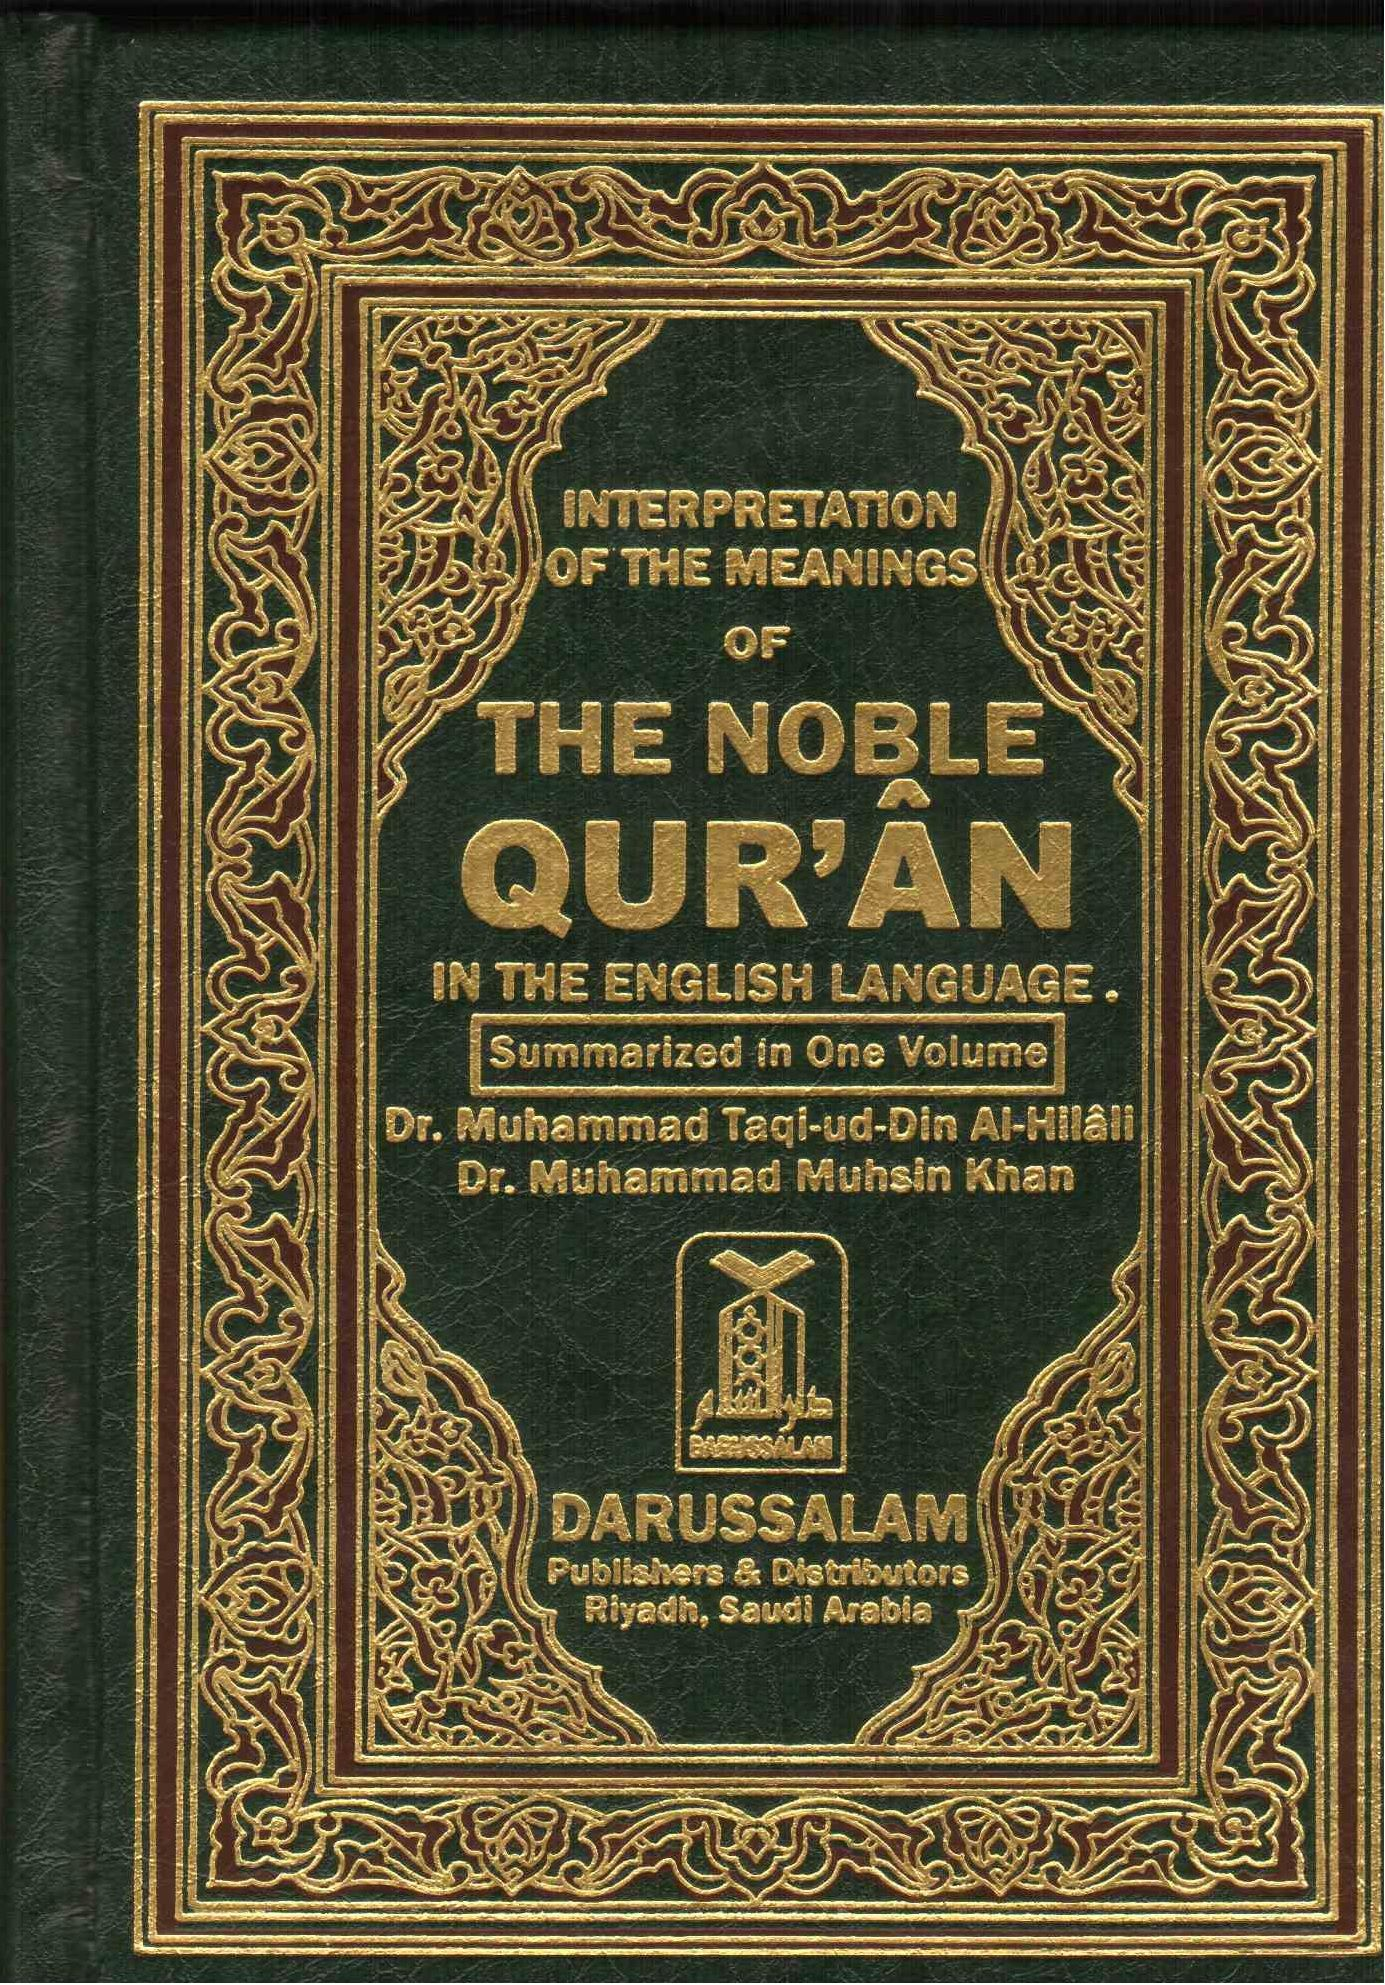 Kuran, Quran, Qouran, Koran, The Holy Quran